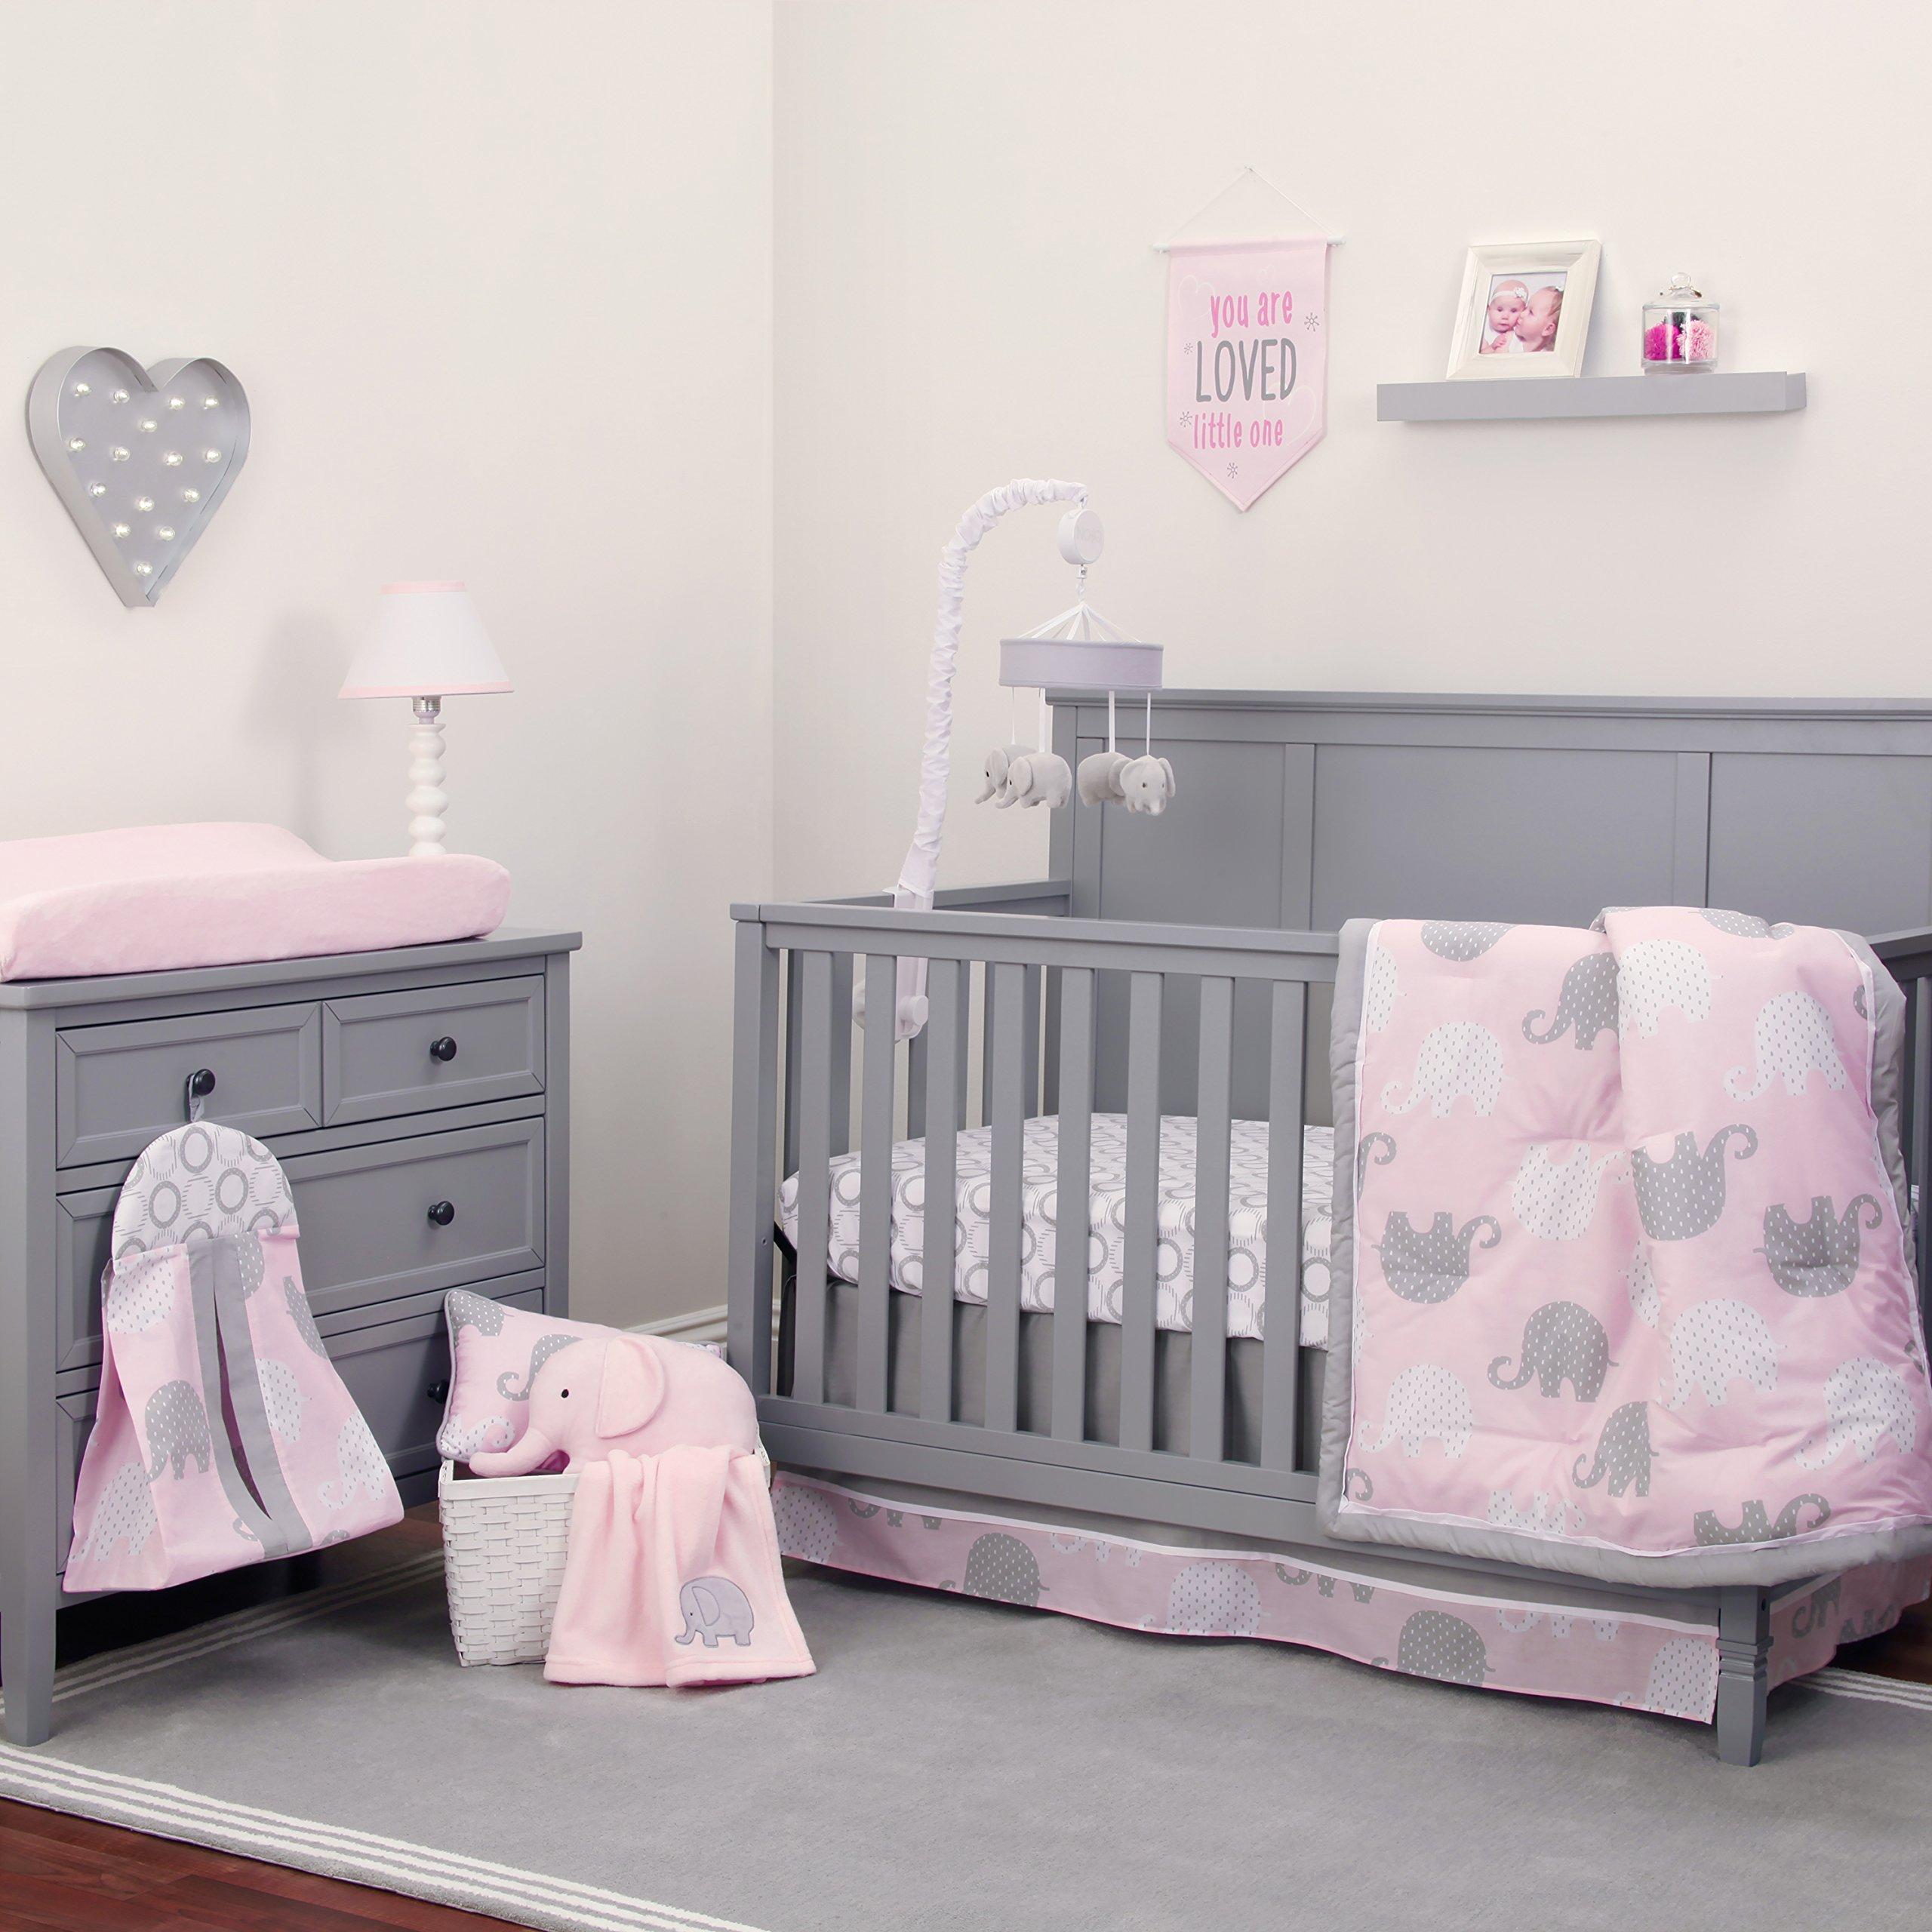 grey pink and white baby room amazon com rh amazon com grey baby room curtains grey baby room ideas